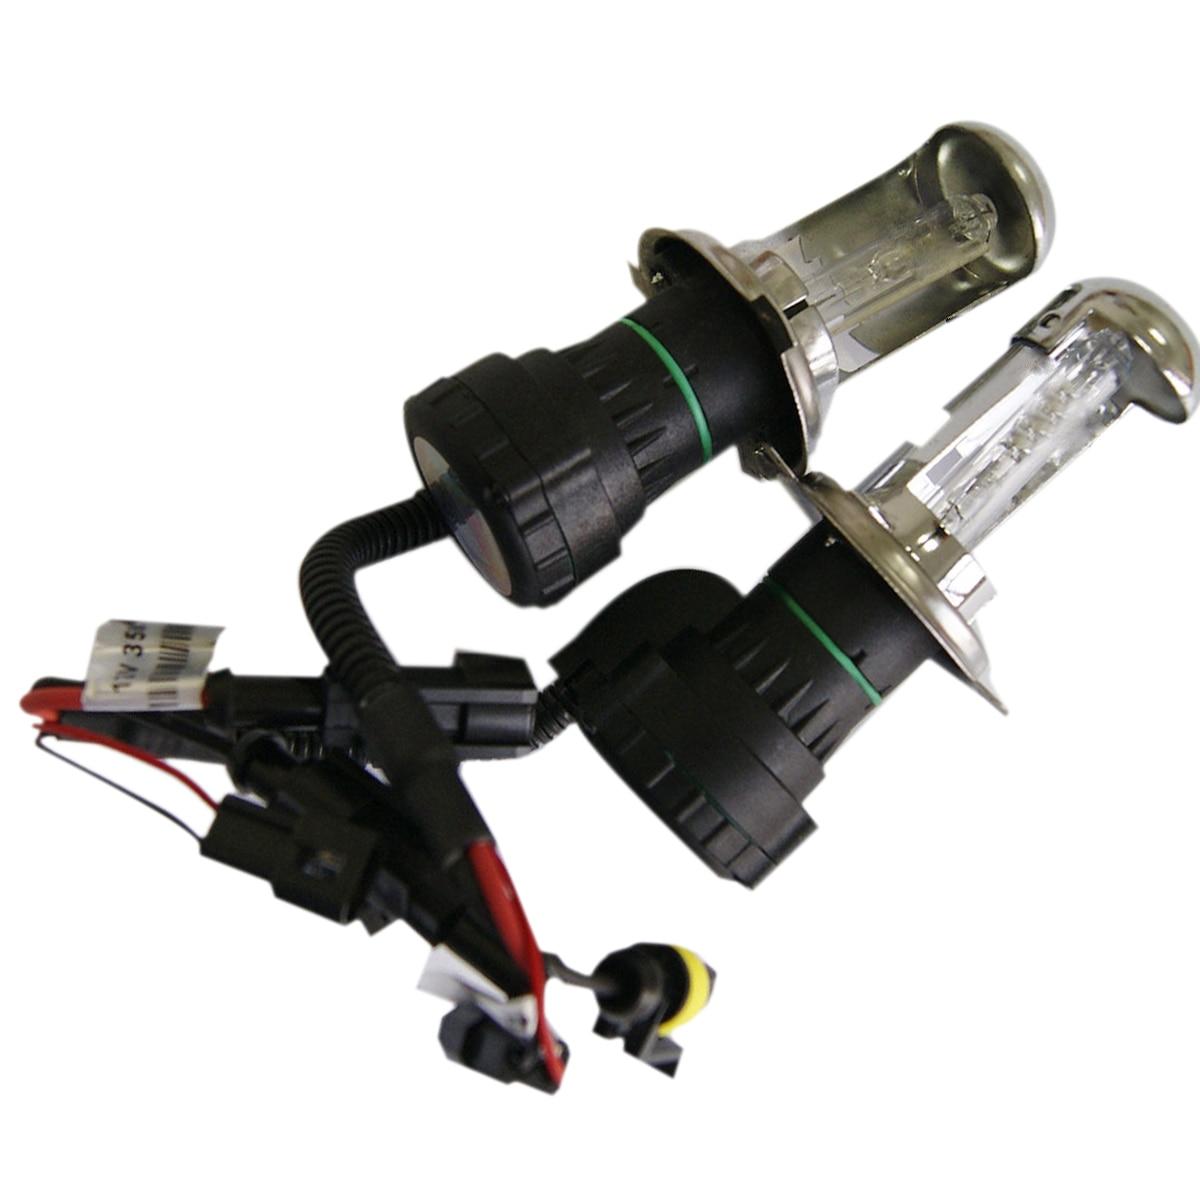 Tonewan 2X H4-3 Xenon 12v 35W H4 xenon HID For Car Headlight Replacement lamps Bulb light H4 Xenon Hi/Lo Beam 3000K-12000K